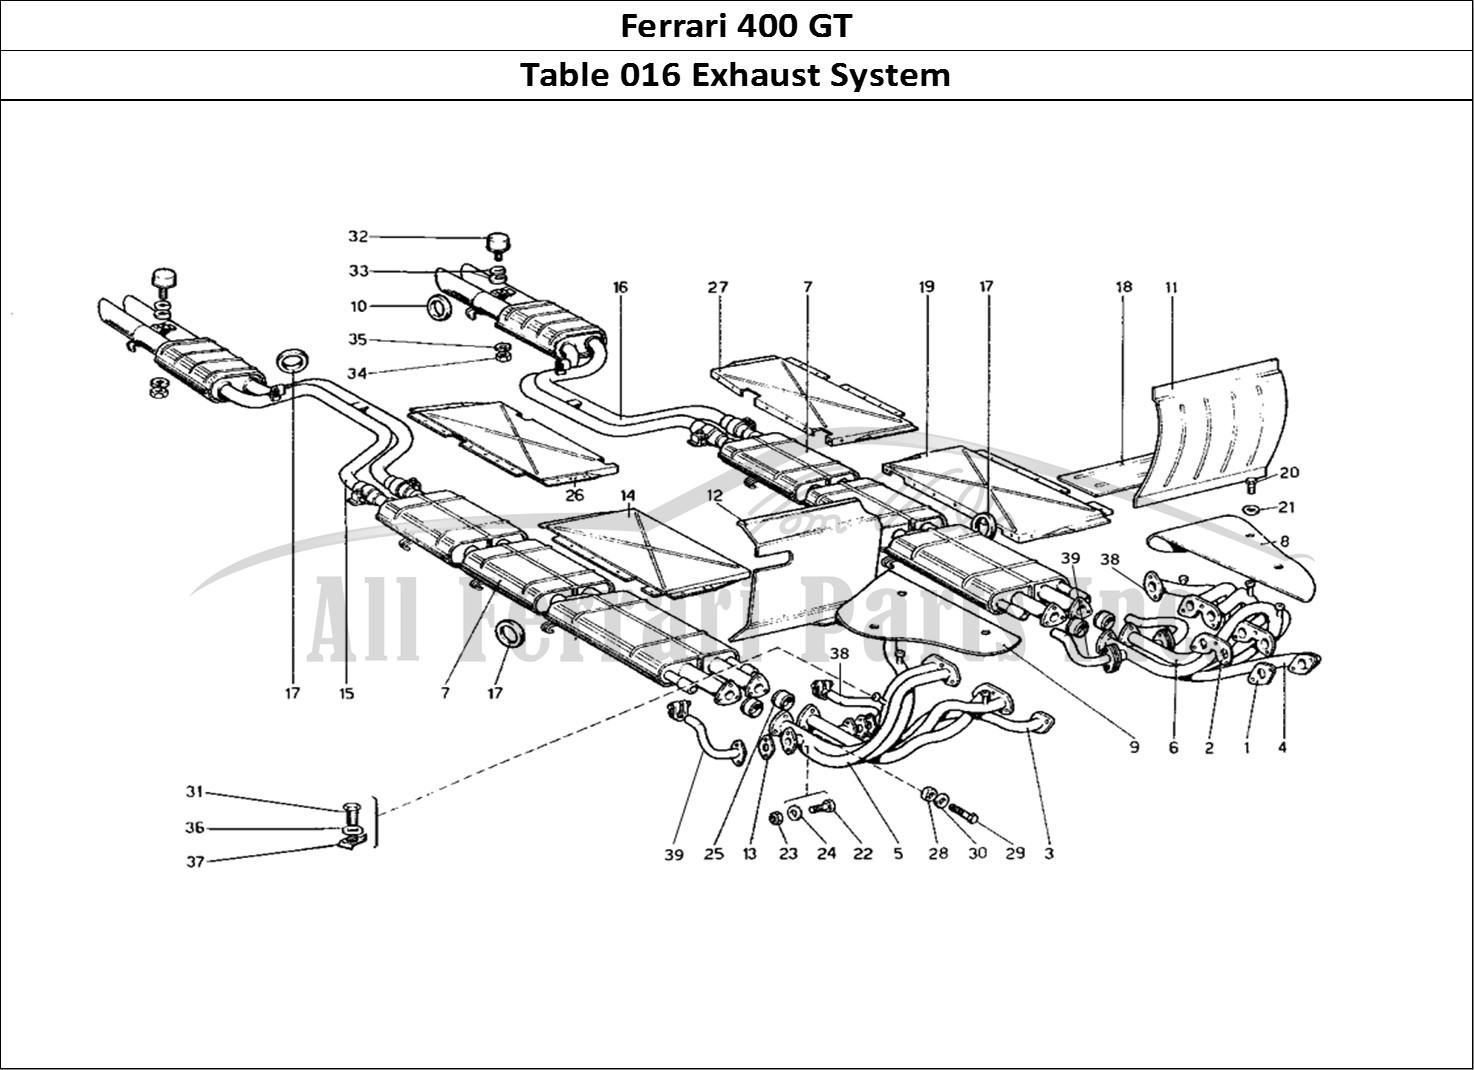 buy original ferrari 400 gt 016 exhaust system ferrari parts  spares  accessories online